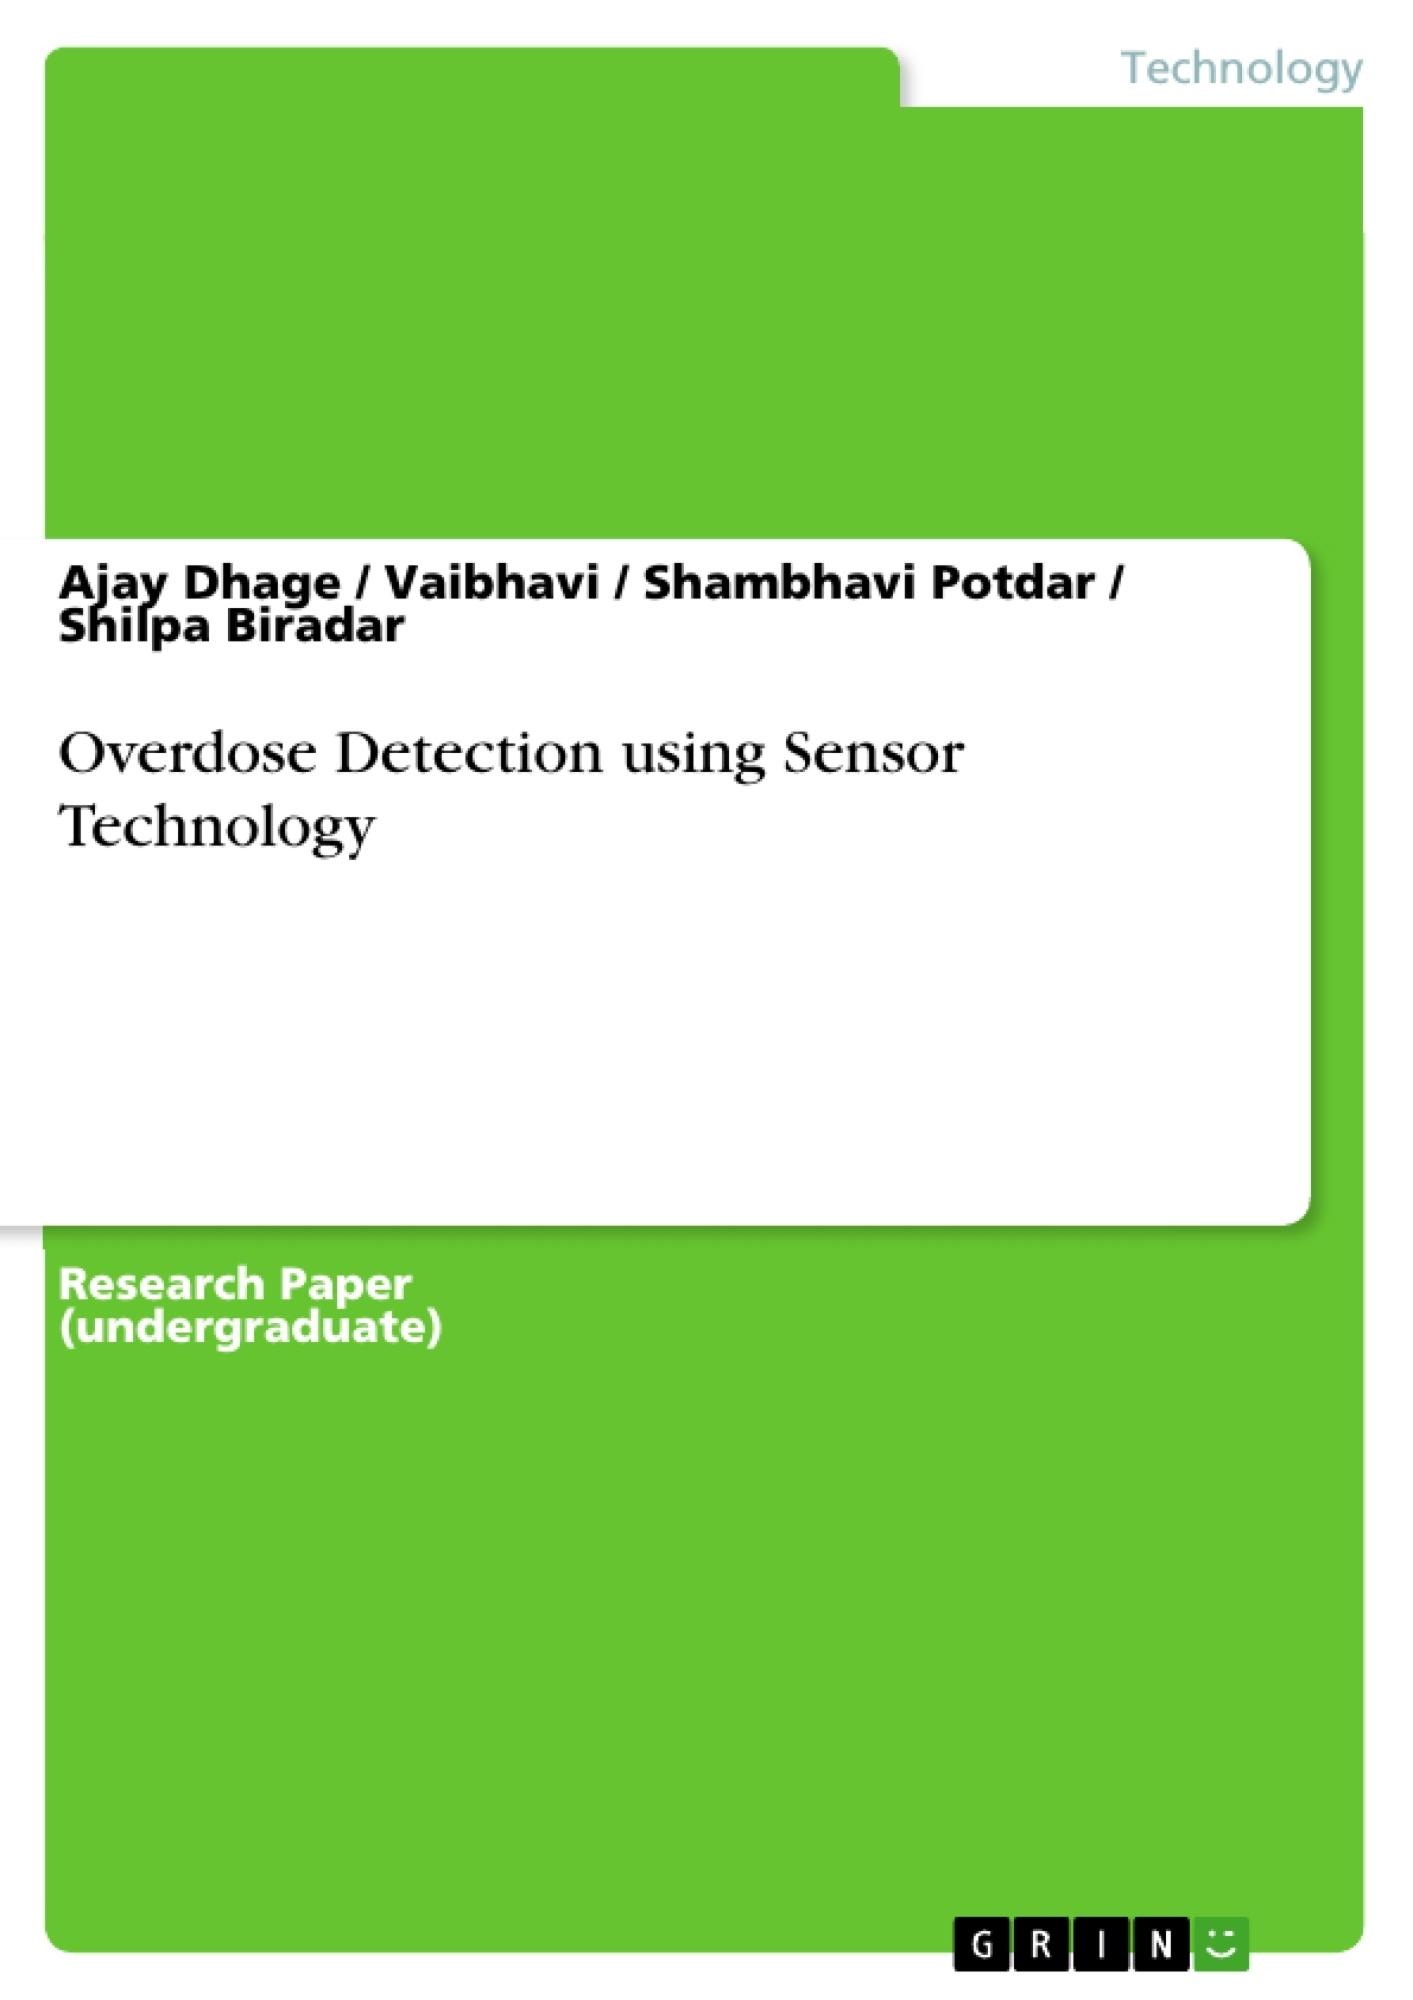 Title: Overdose Detection using Sensor Technology